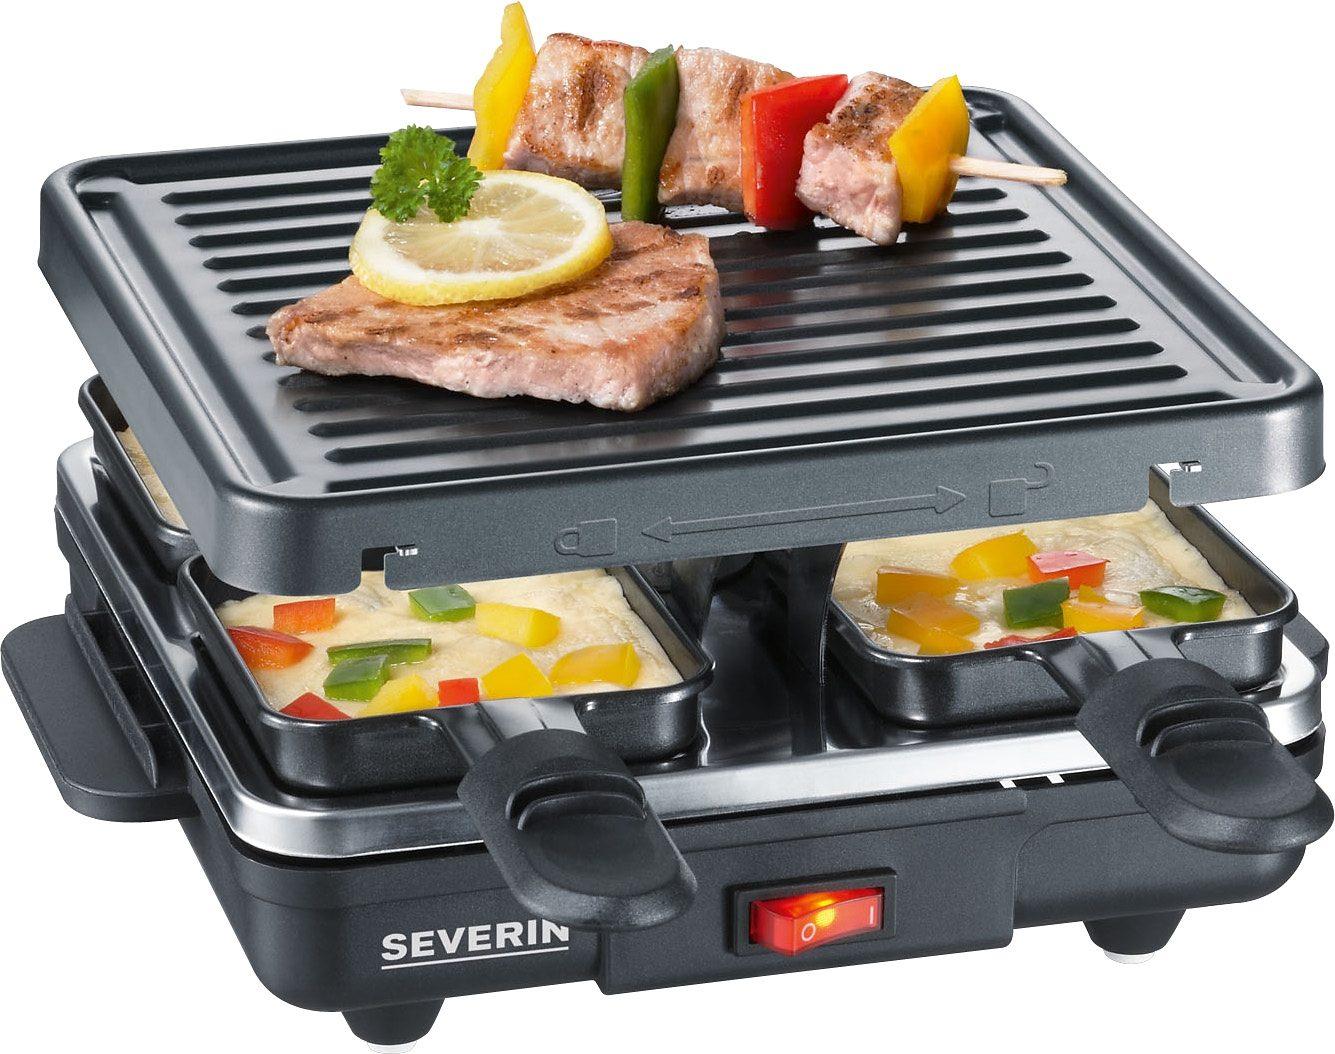 Severin Raclette RG 2686, 600 Watt